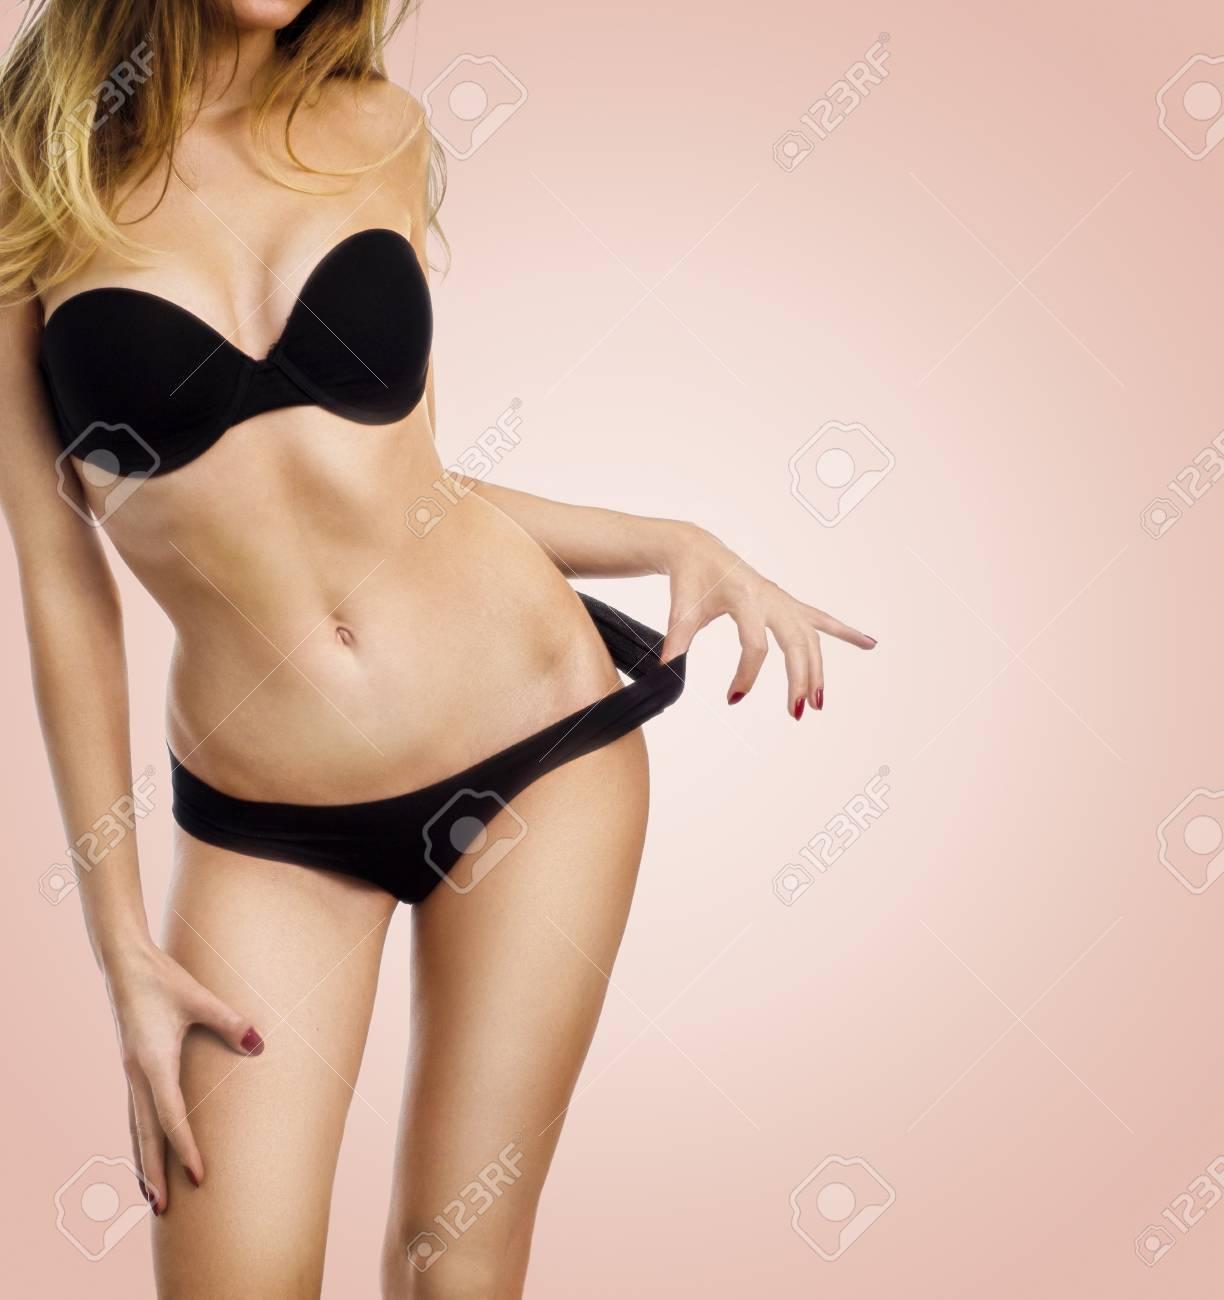 Panties Slime Pictures